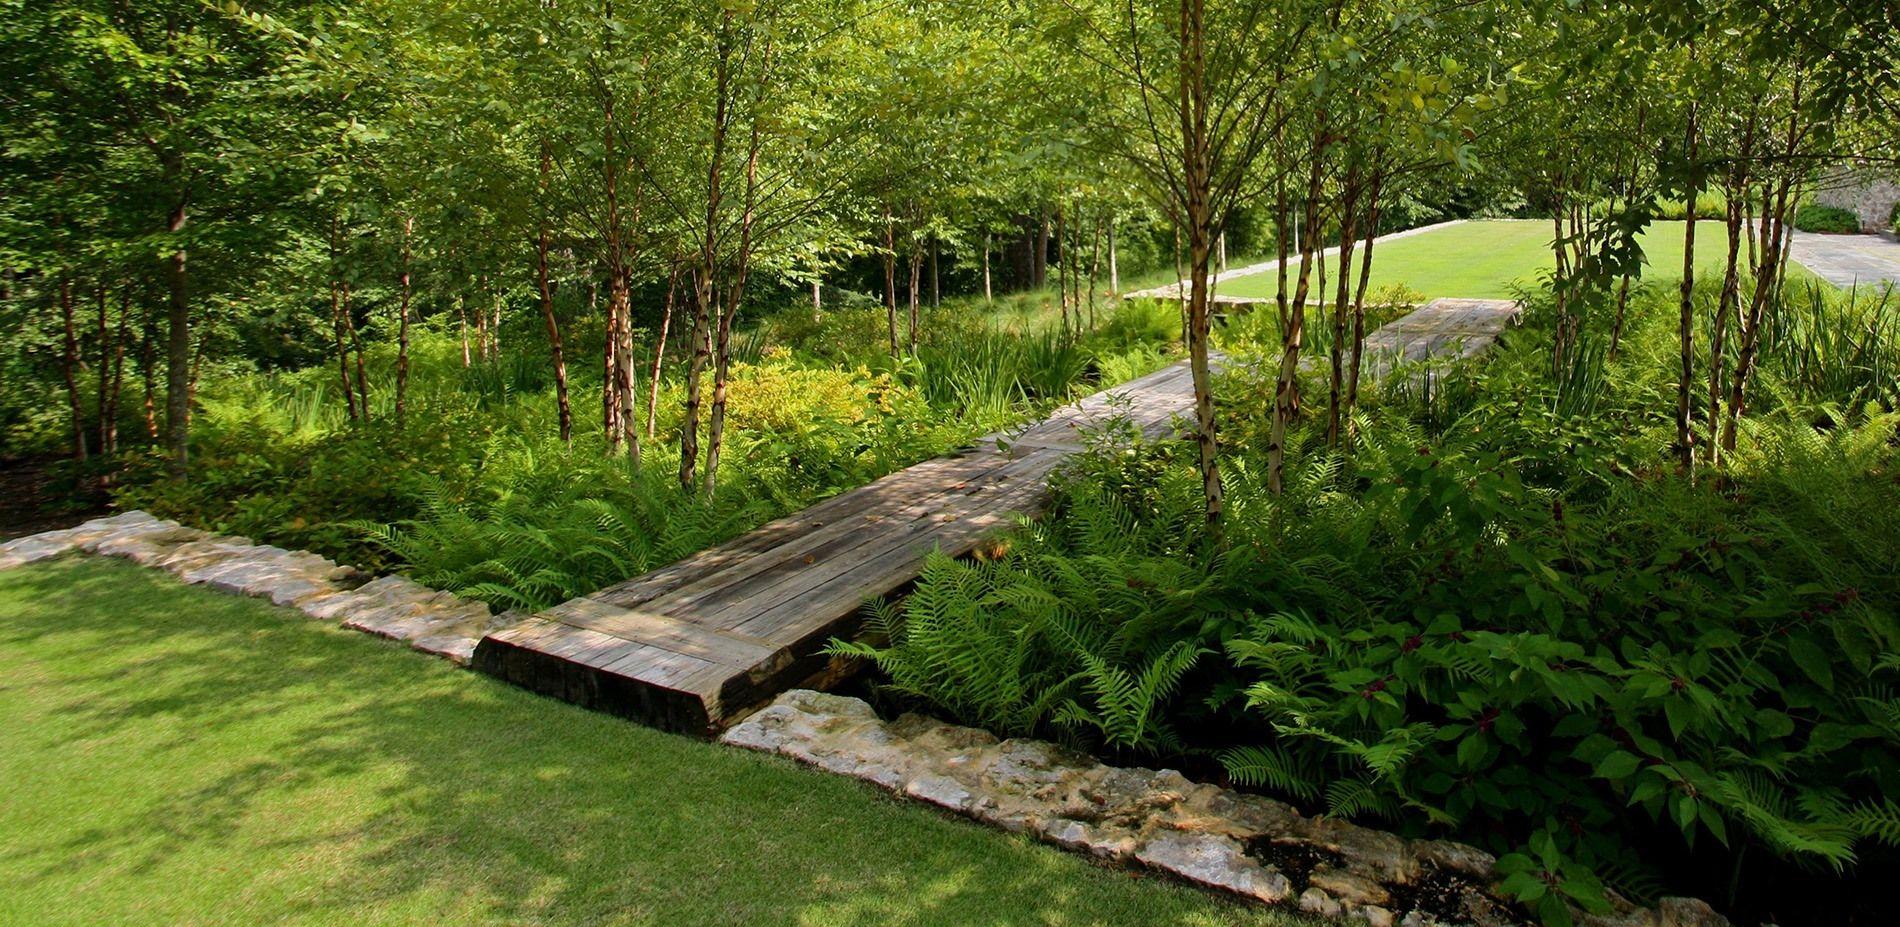 2014 Asla Professional Awards Rain Garden Landscape Architecture Courtyard Landscaping